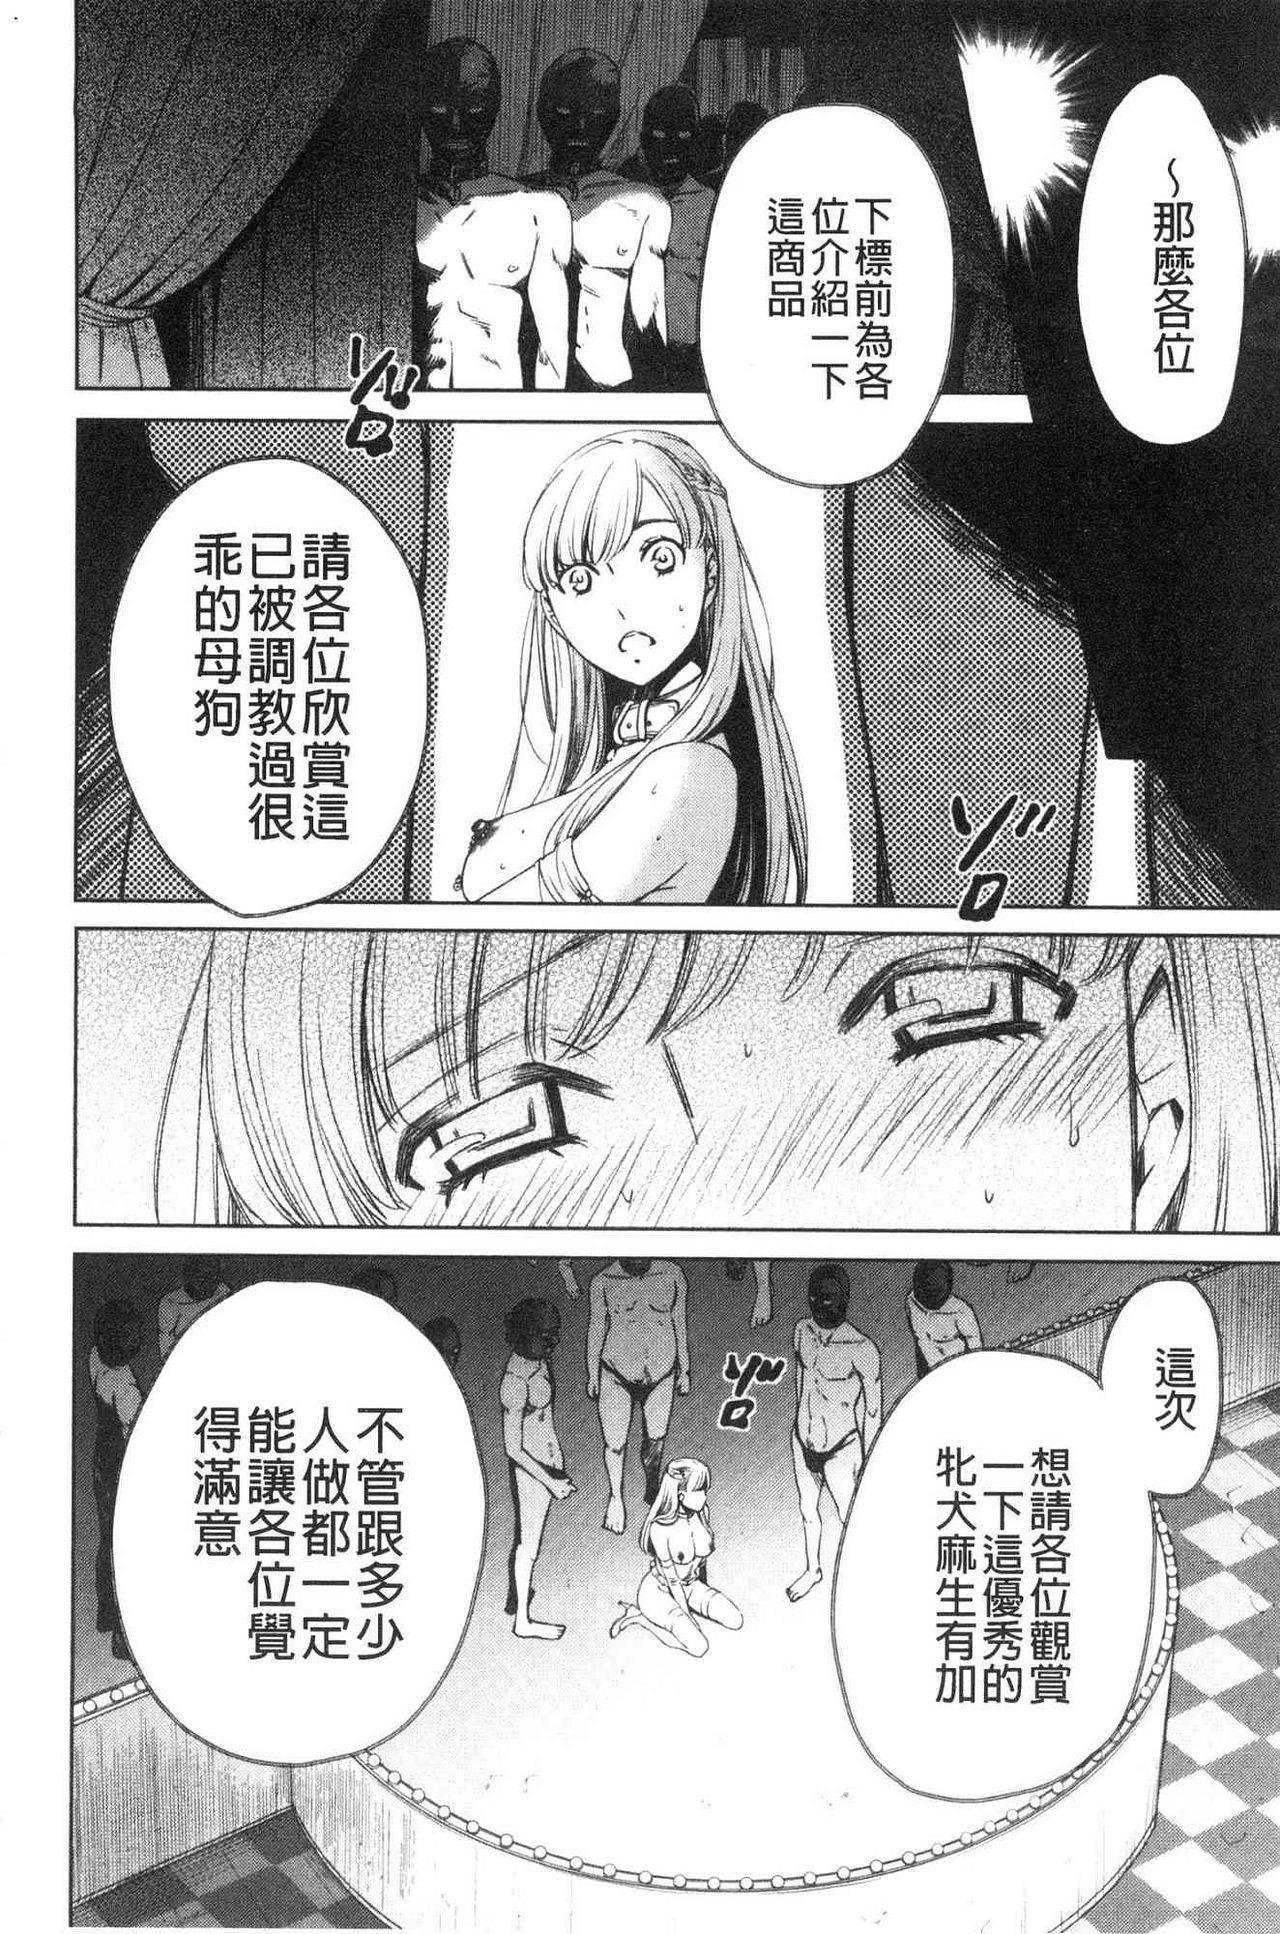 [Gotoh Akira]  21-ji no Onna ~Camera no Mae no Mesuinu~ 2 | 21時之女 ~鏡頭前的牝犬~ 2 [Chinese] 171